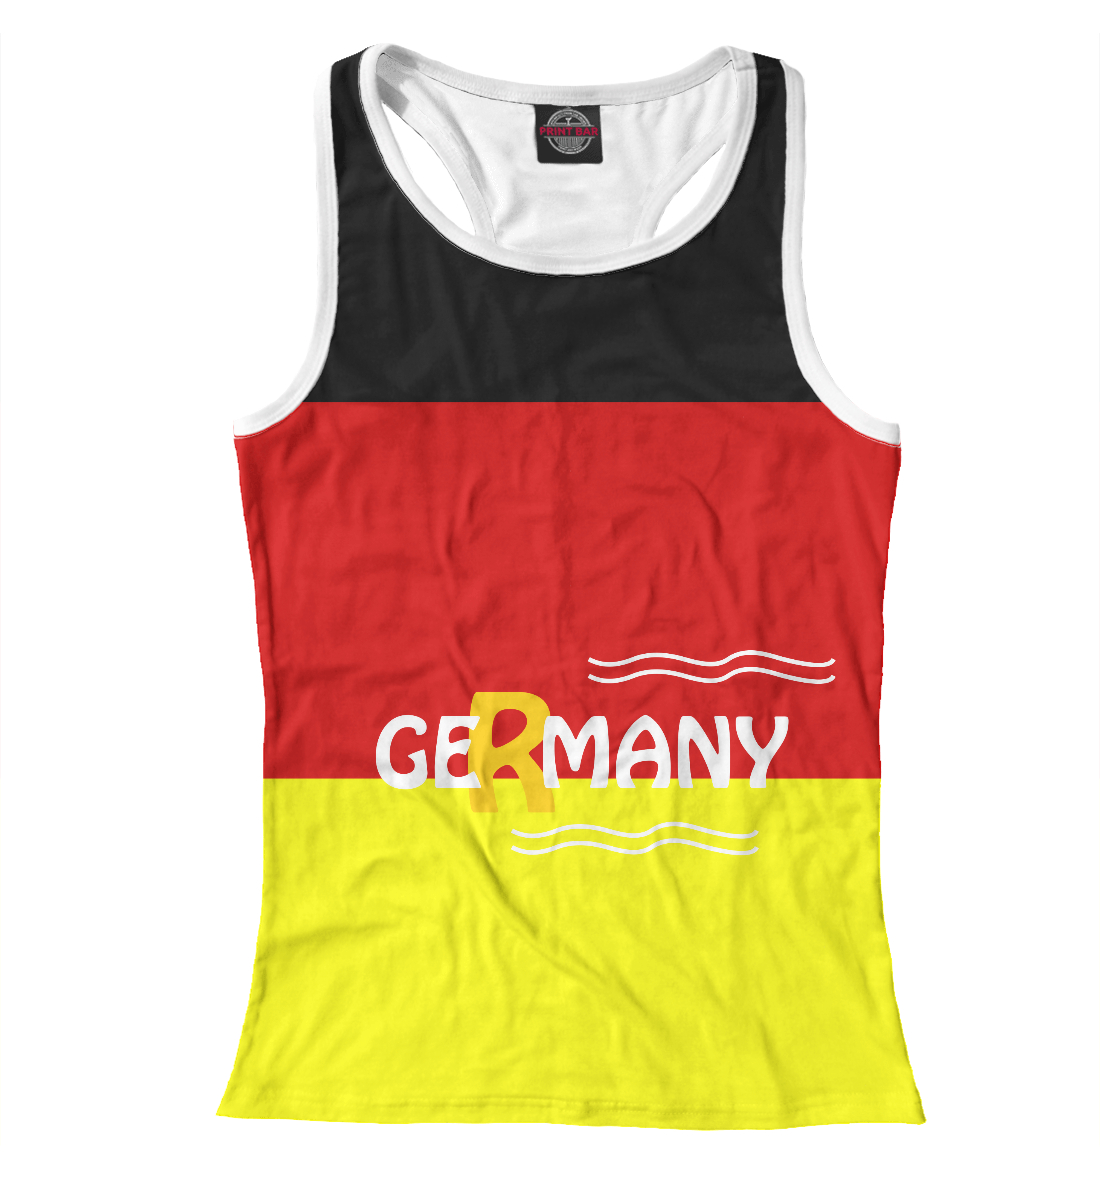 Купить Германия, Printbar, Майки борцовки, GER-199229-mayb-1